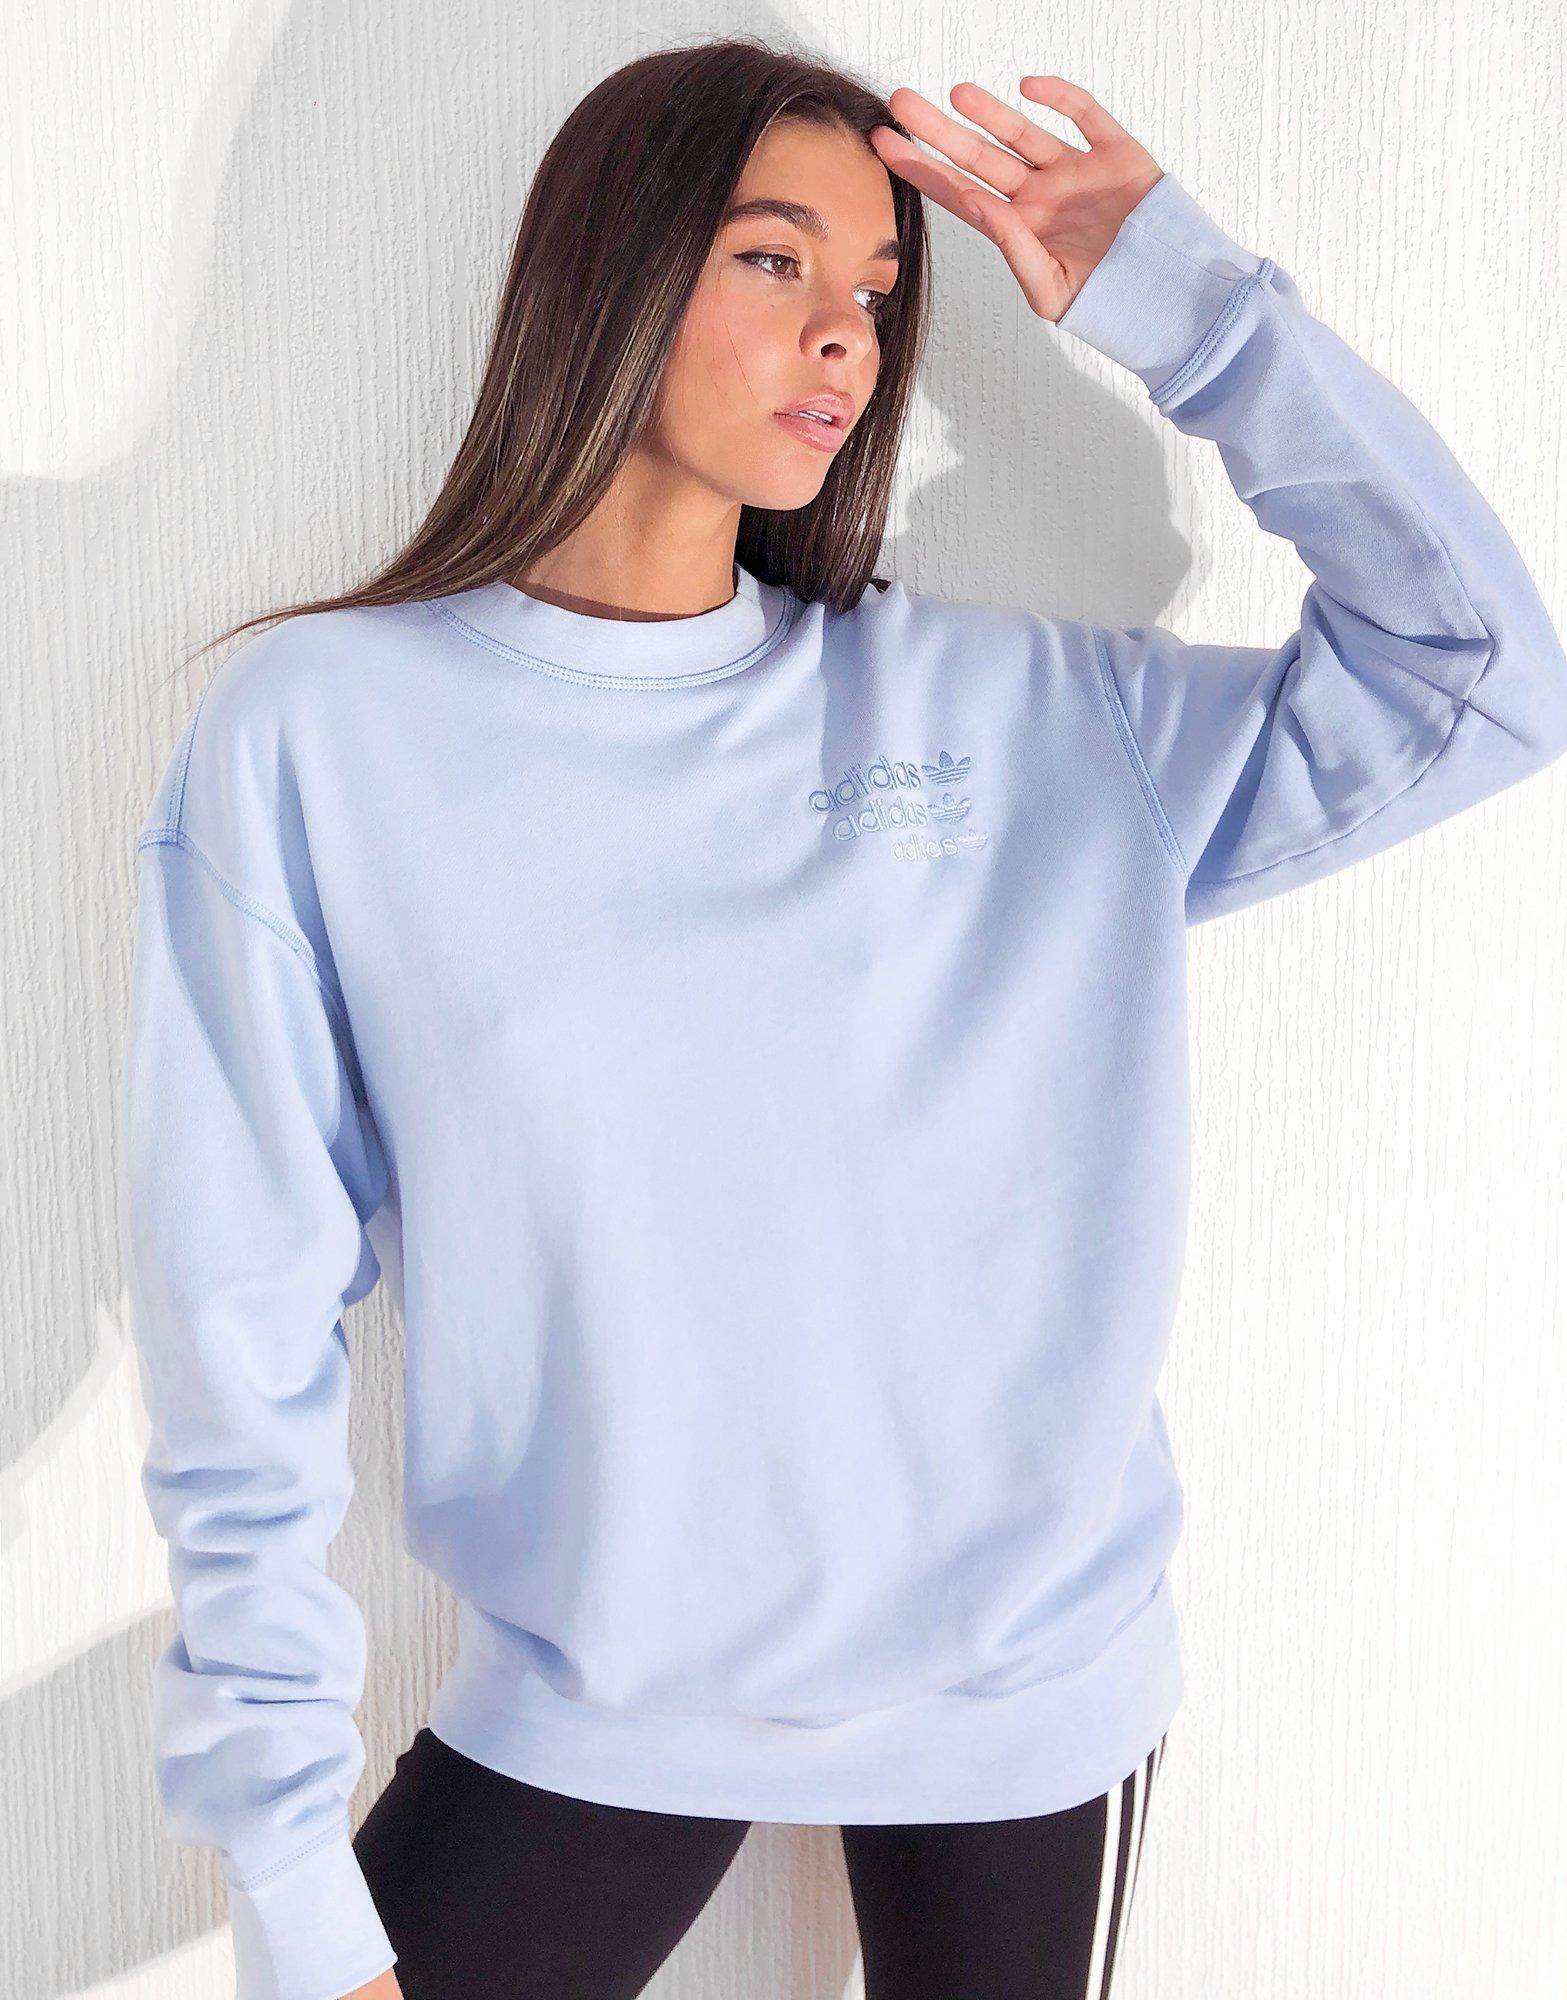 grado desagüe Domar  Buy Blue adidas Originals Overdyed Crew Sweatshirt Women's | JD Sports